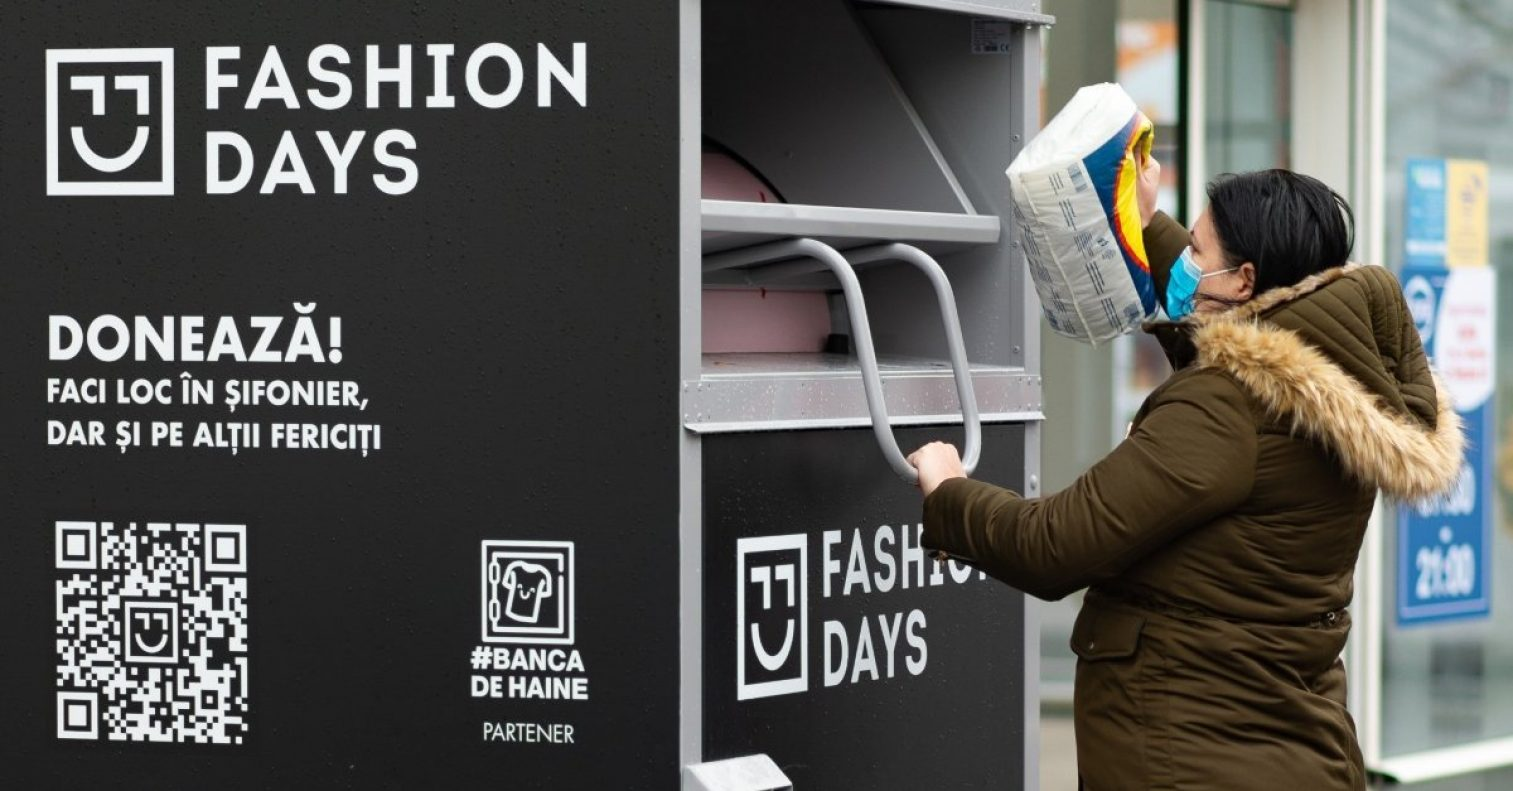 Fashion Days Banca De Haine